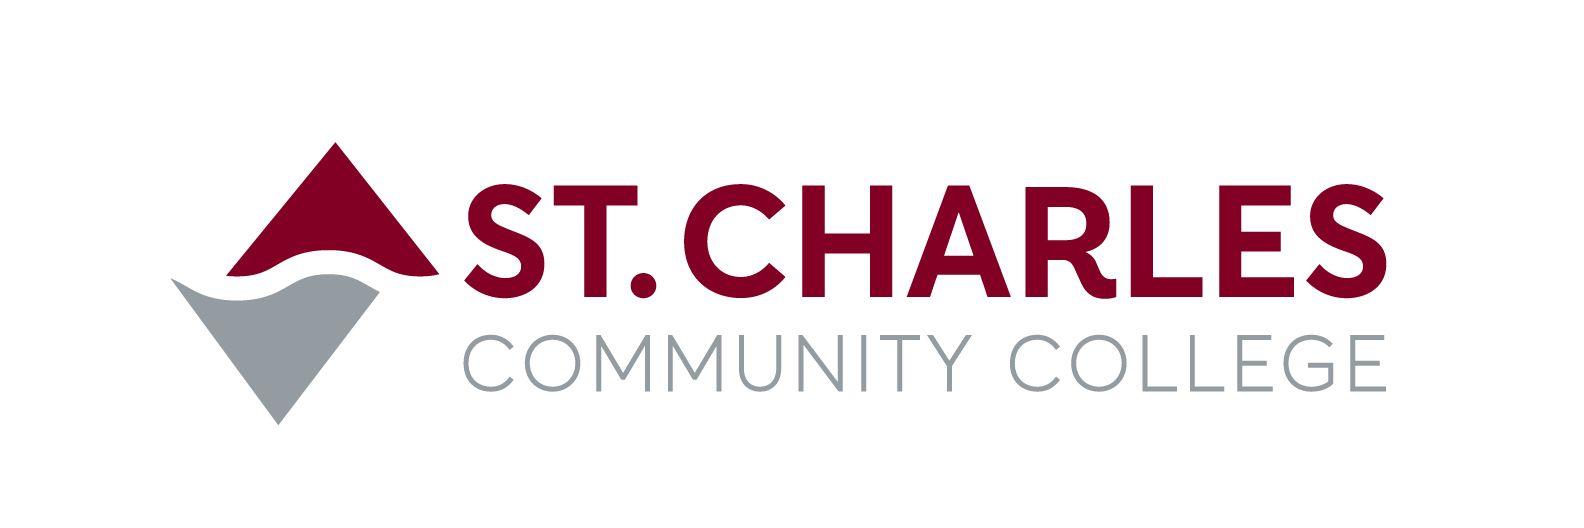 stchas Logo